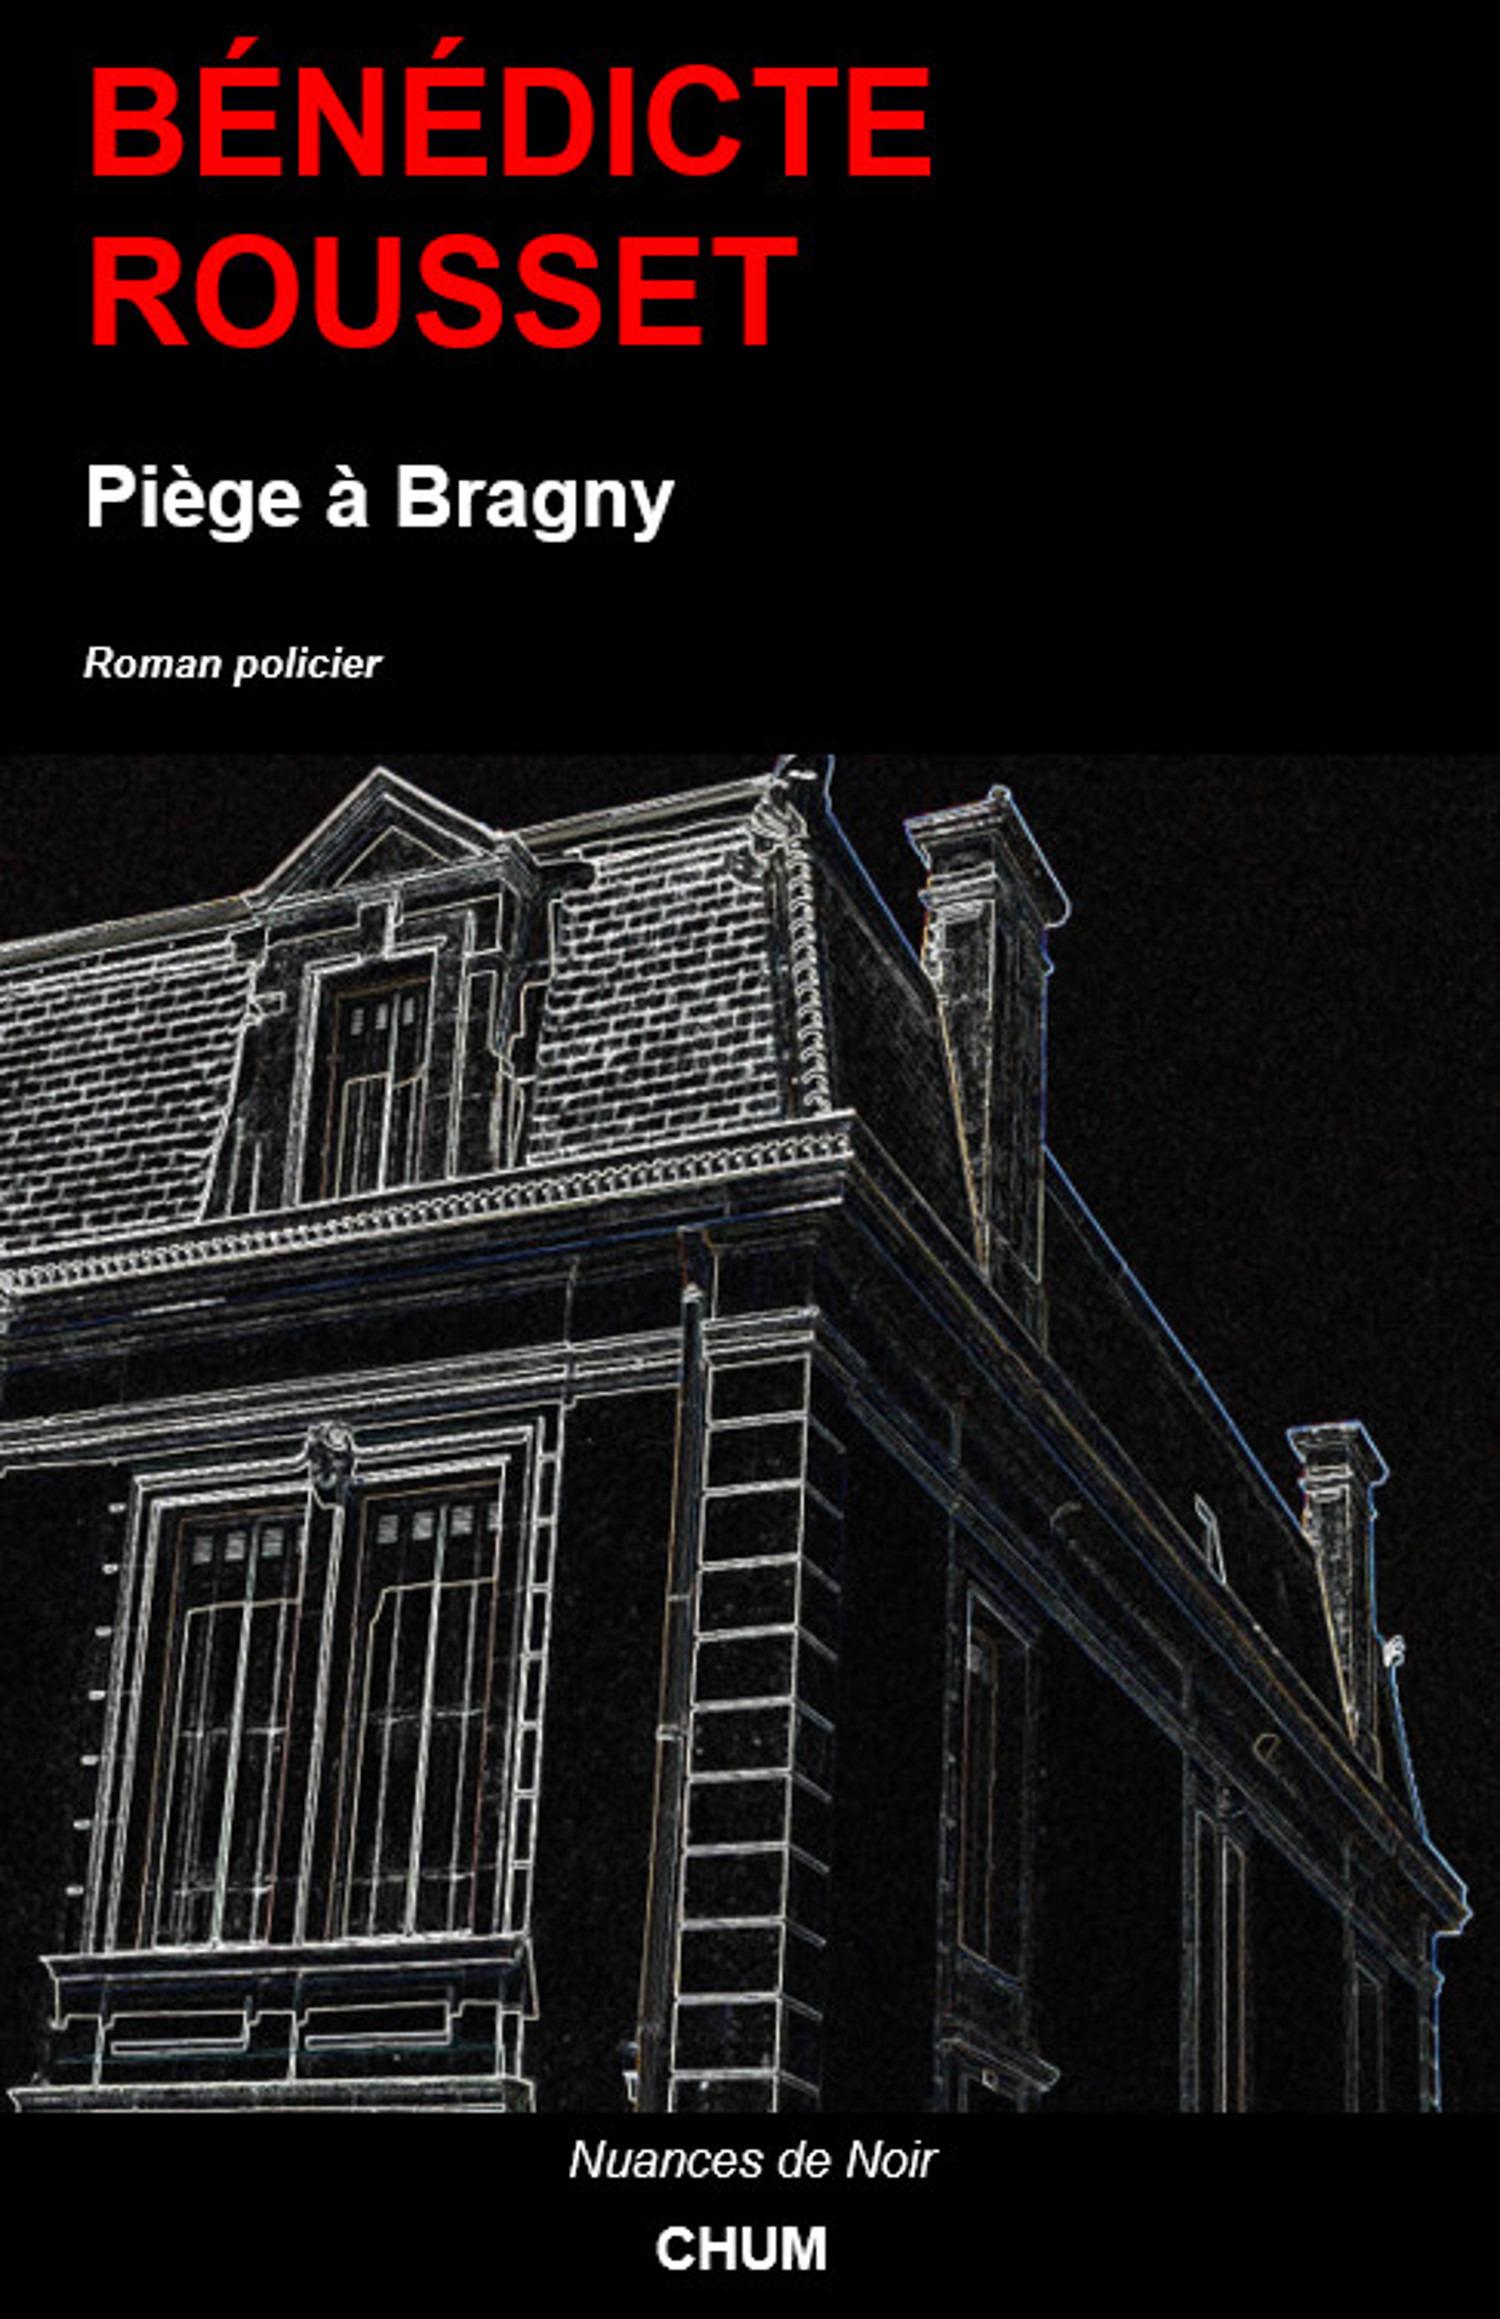 Piège à Bragny